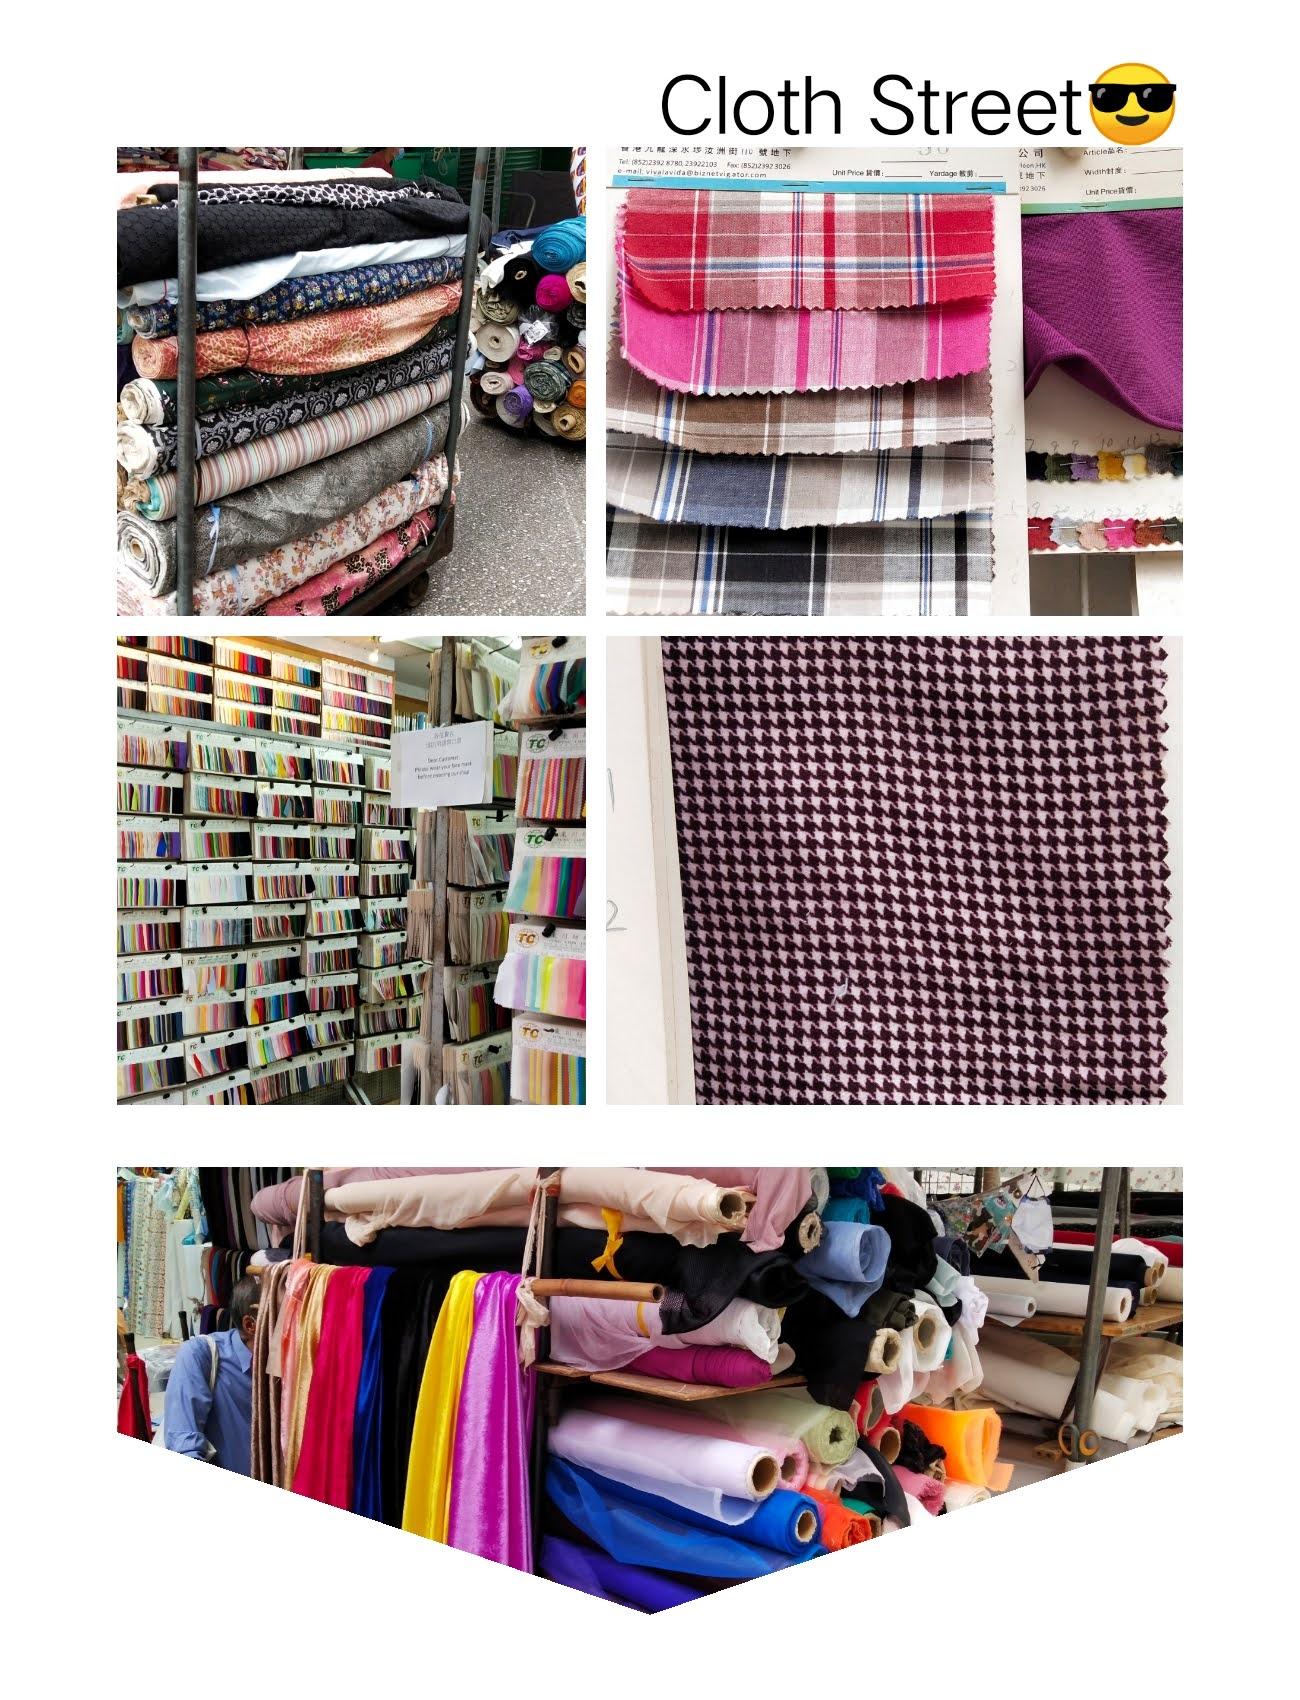 Cloth Street